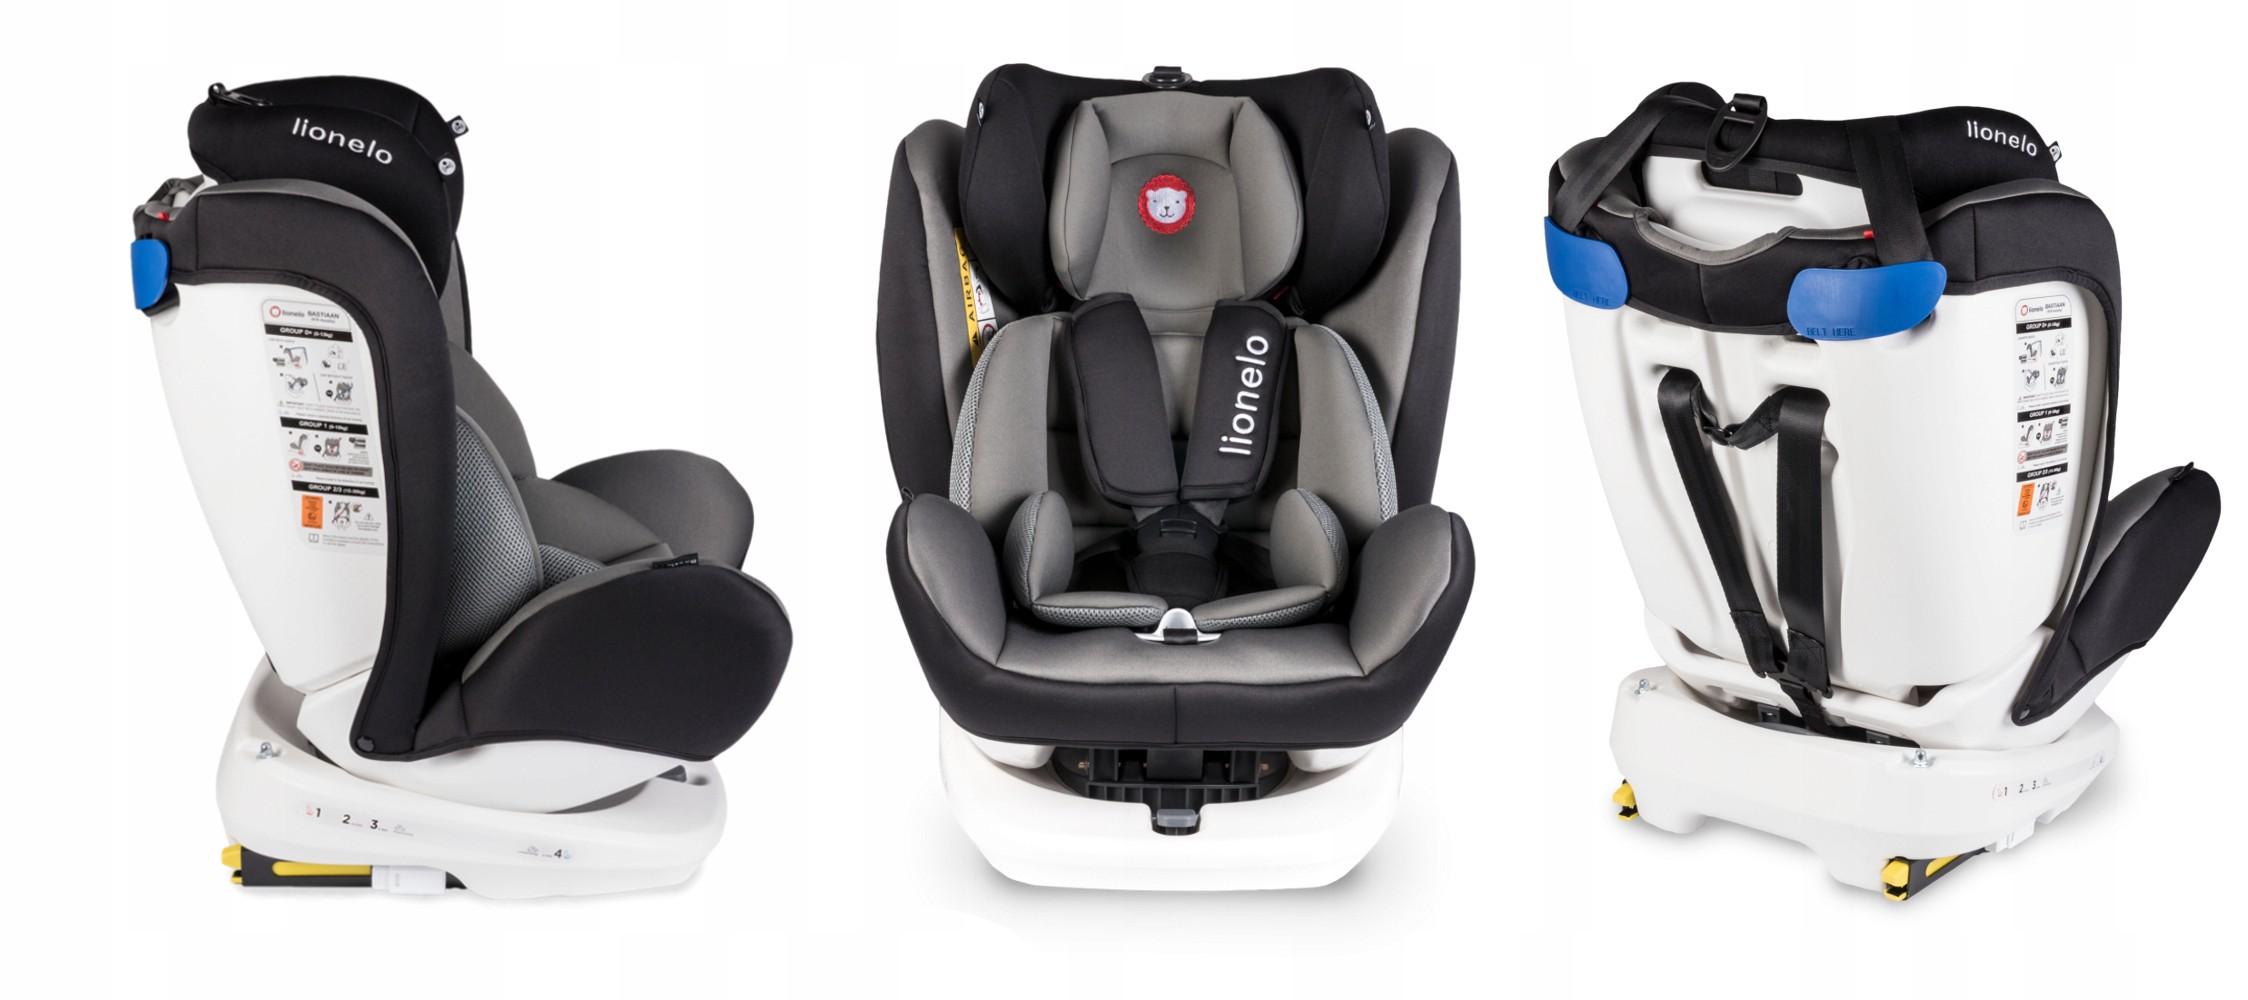 Lionelo-Bastiaan-360-Auto-Kindersitz-Autositz-ISOFIX-9-36Kg-Gruppe-0-1-2-3-TUV Indexbild 8